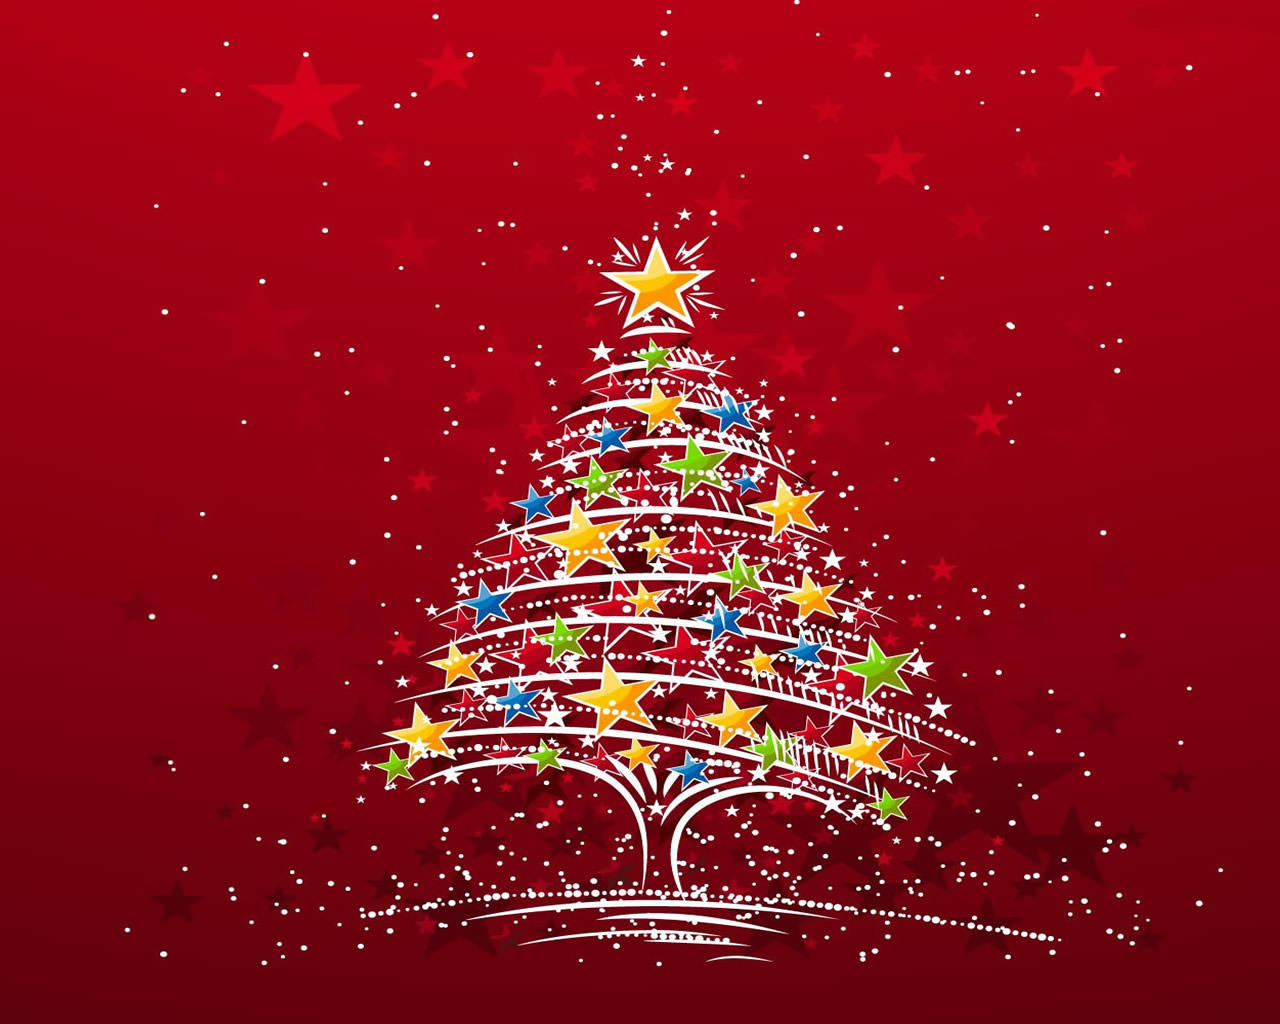 Christmas Wallpaper 1280x1024 1280x1024